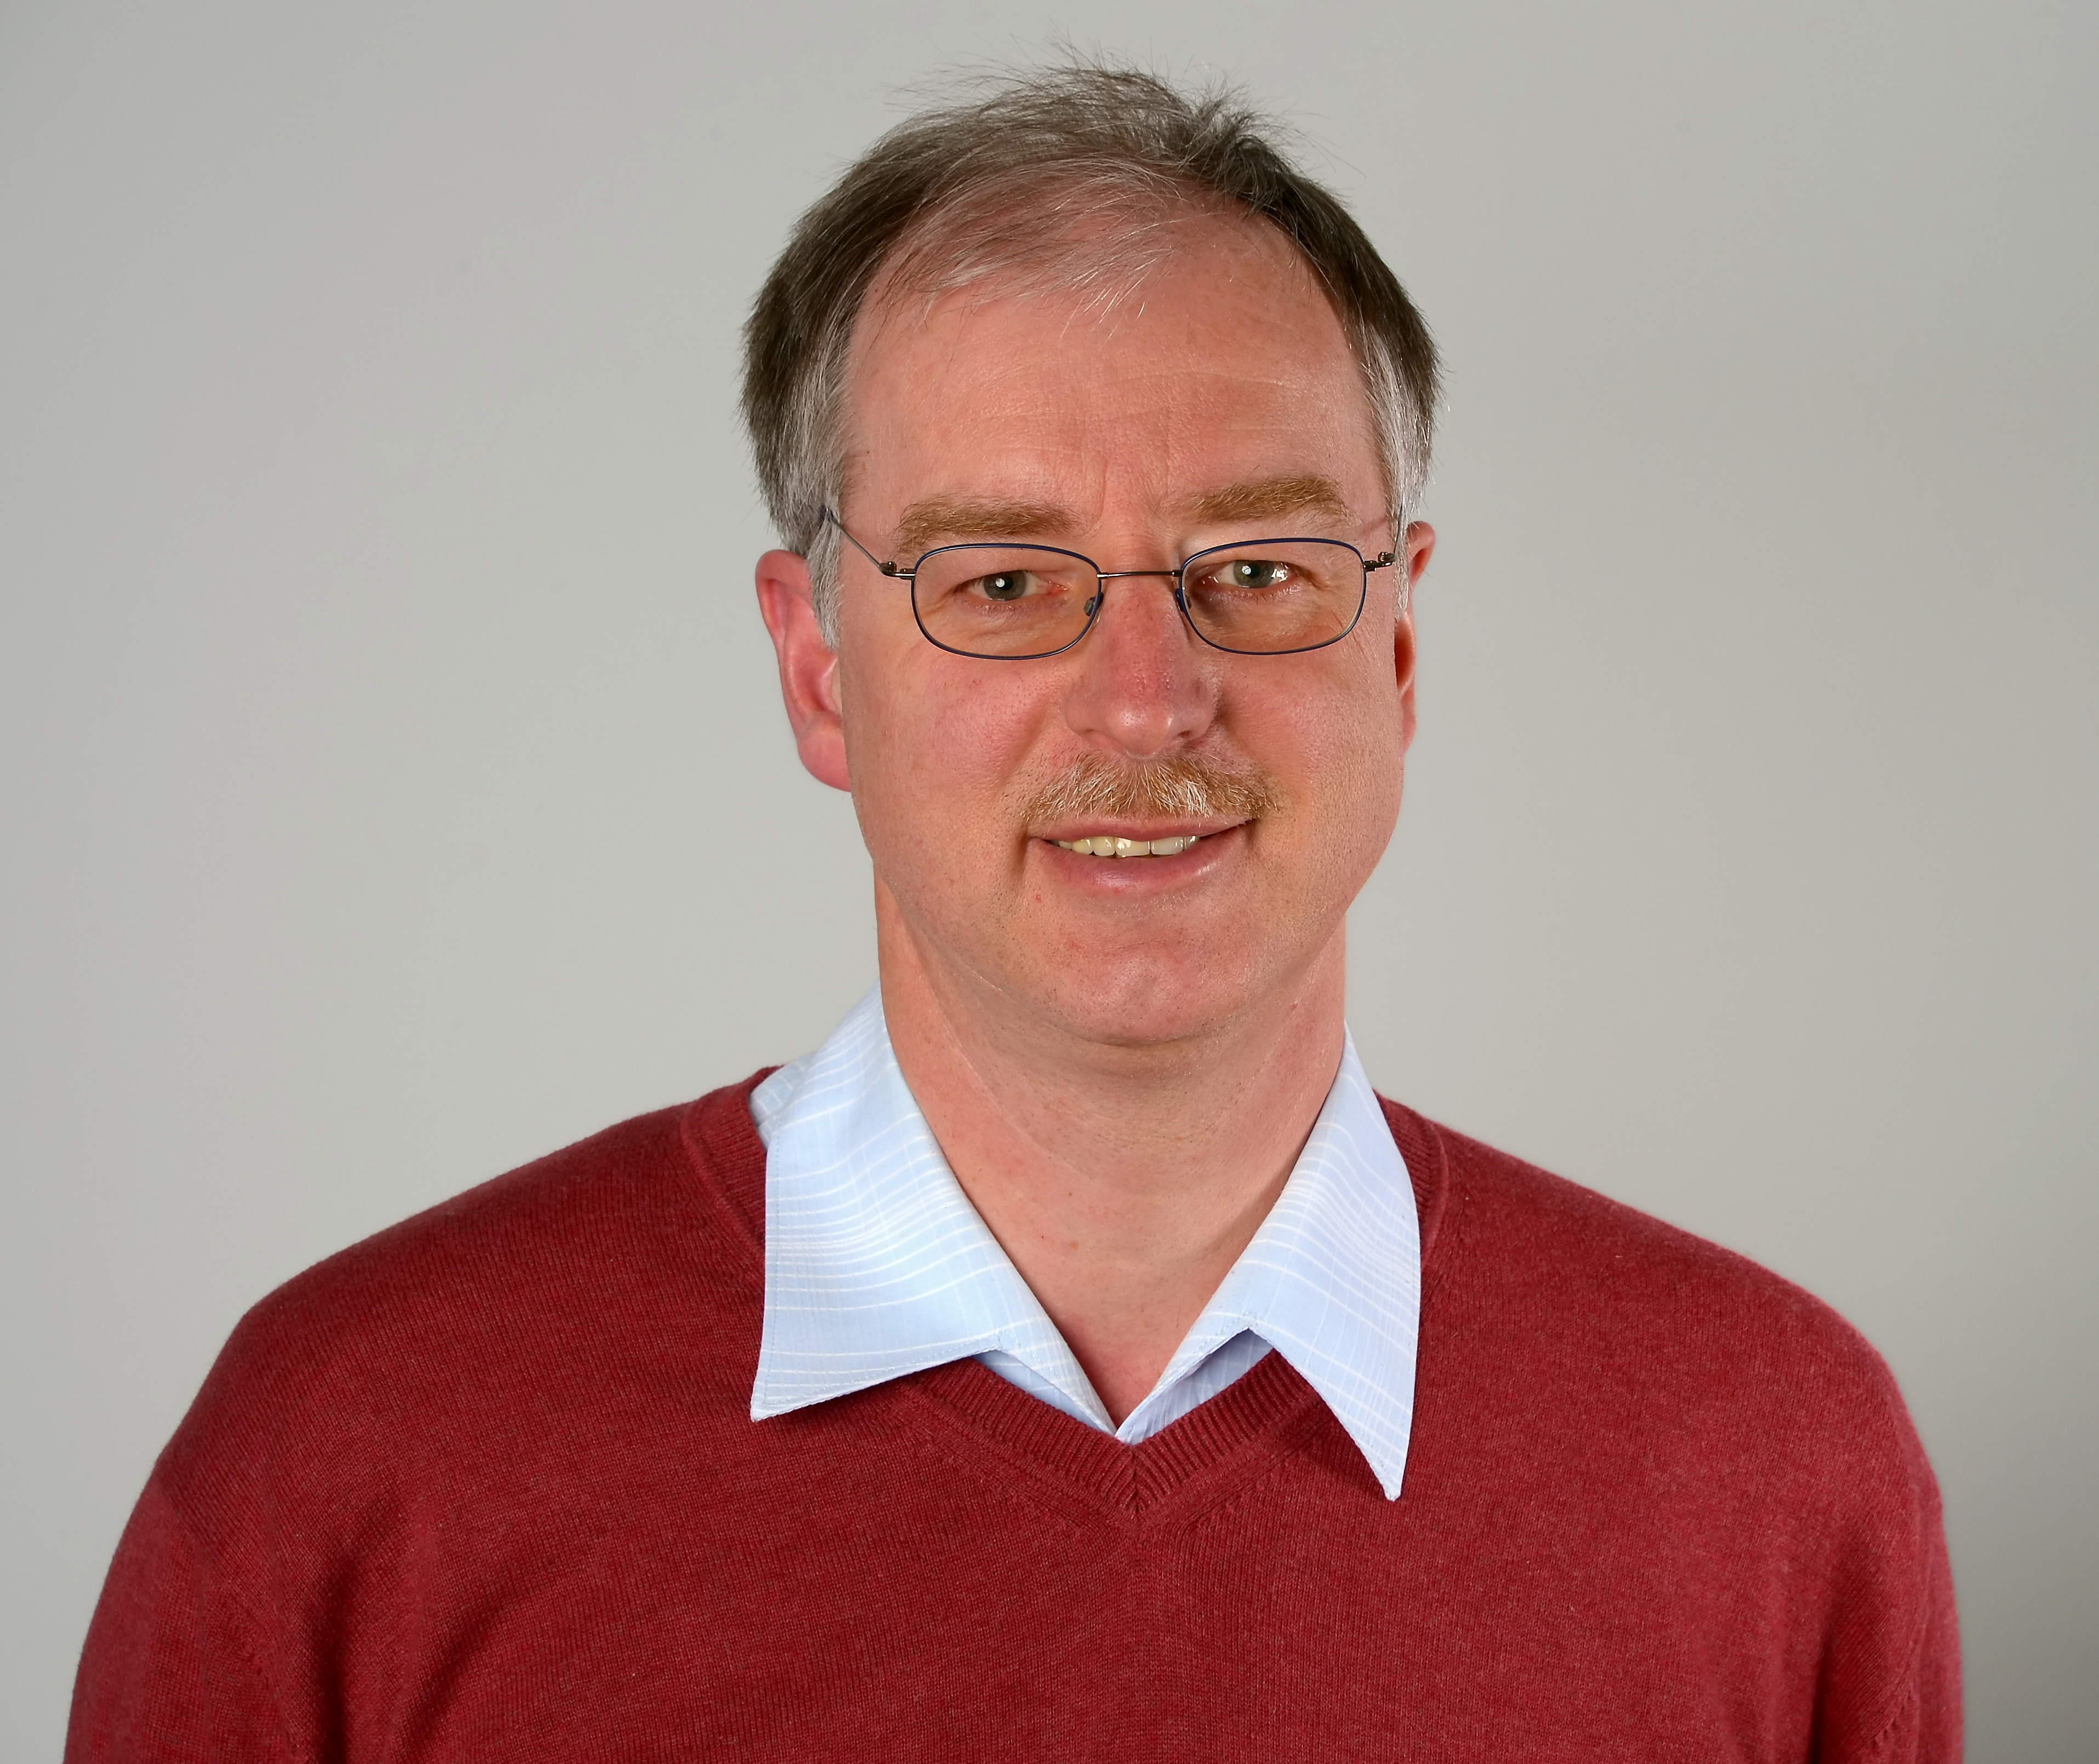 Jens Burmeister